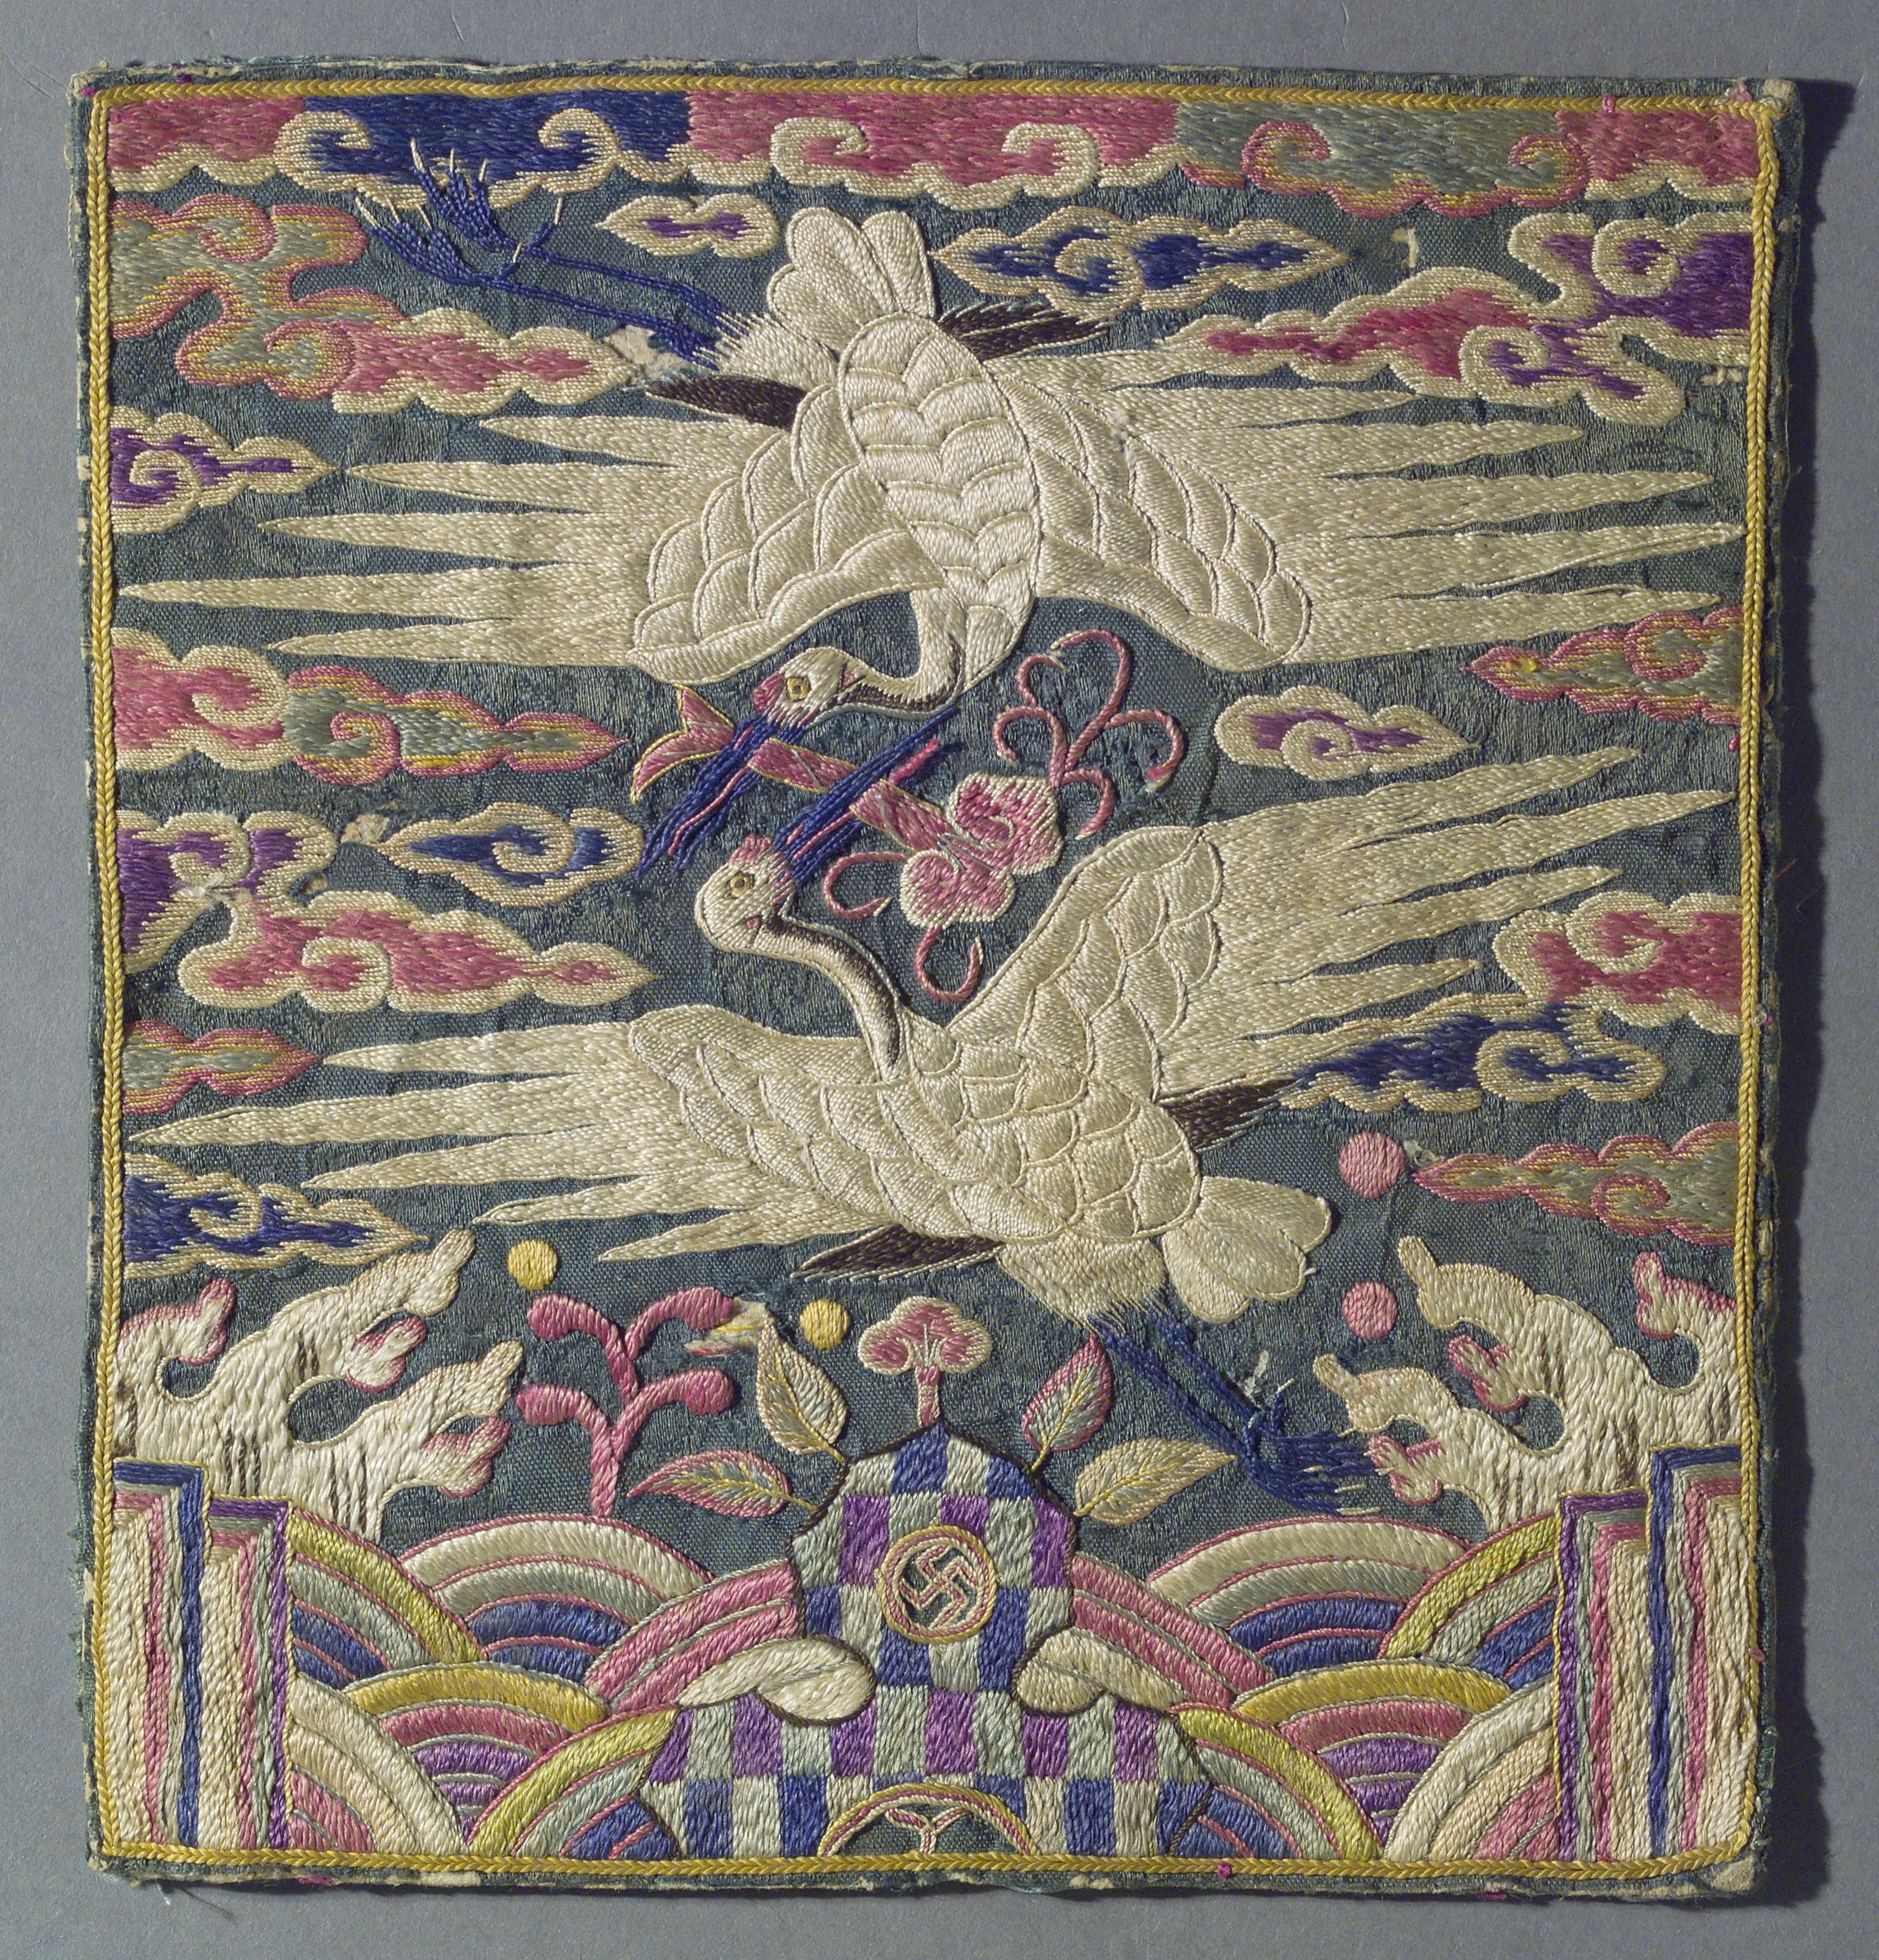 Rank Badge With A Pair Of Cranes Korea Joseon Dynasty